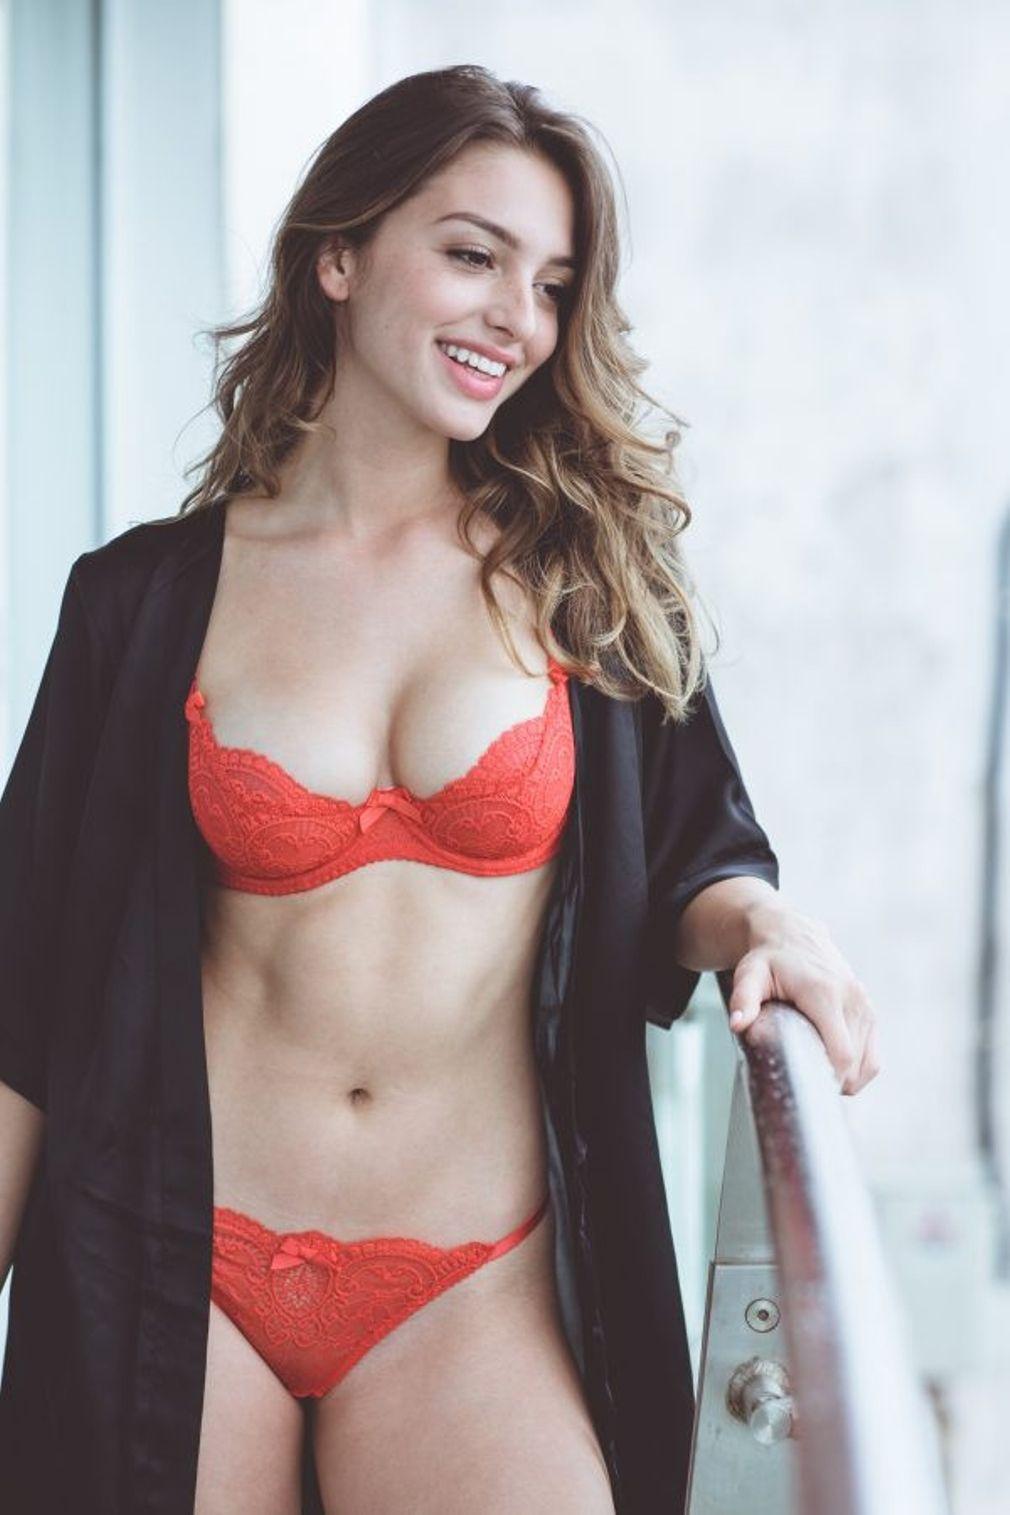 Porn Kate Mara nude (55 photos), Topless, Sideboobs, Feet, panties 2018